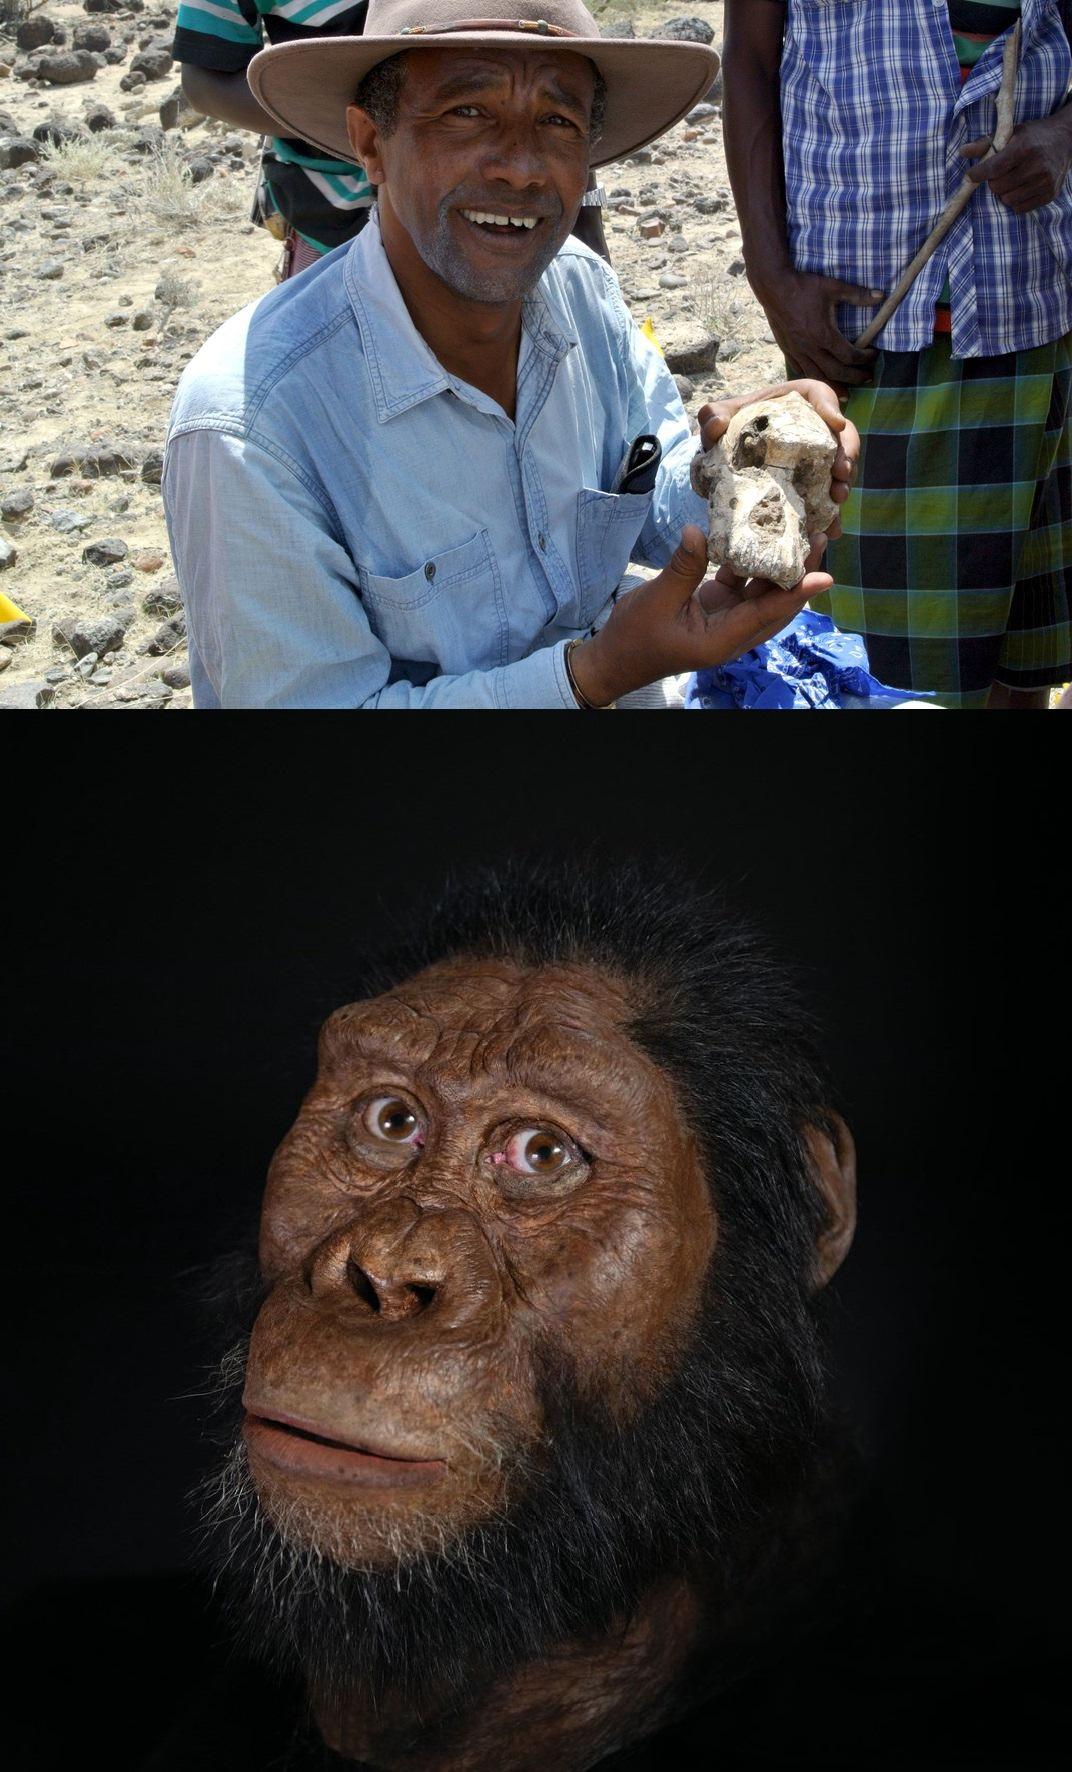 human ancestor in ethiopia.jpg